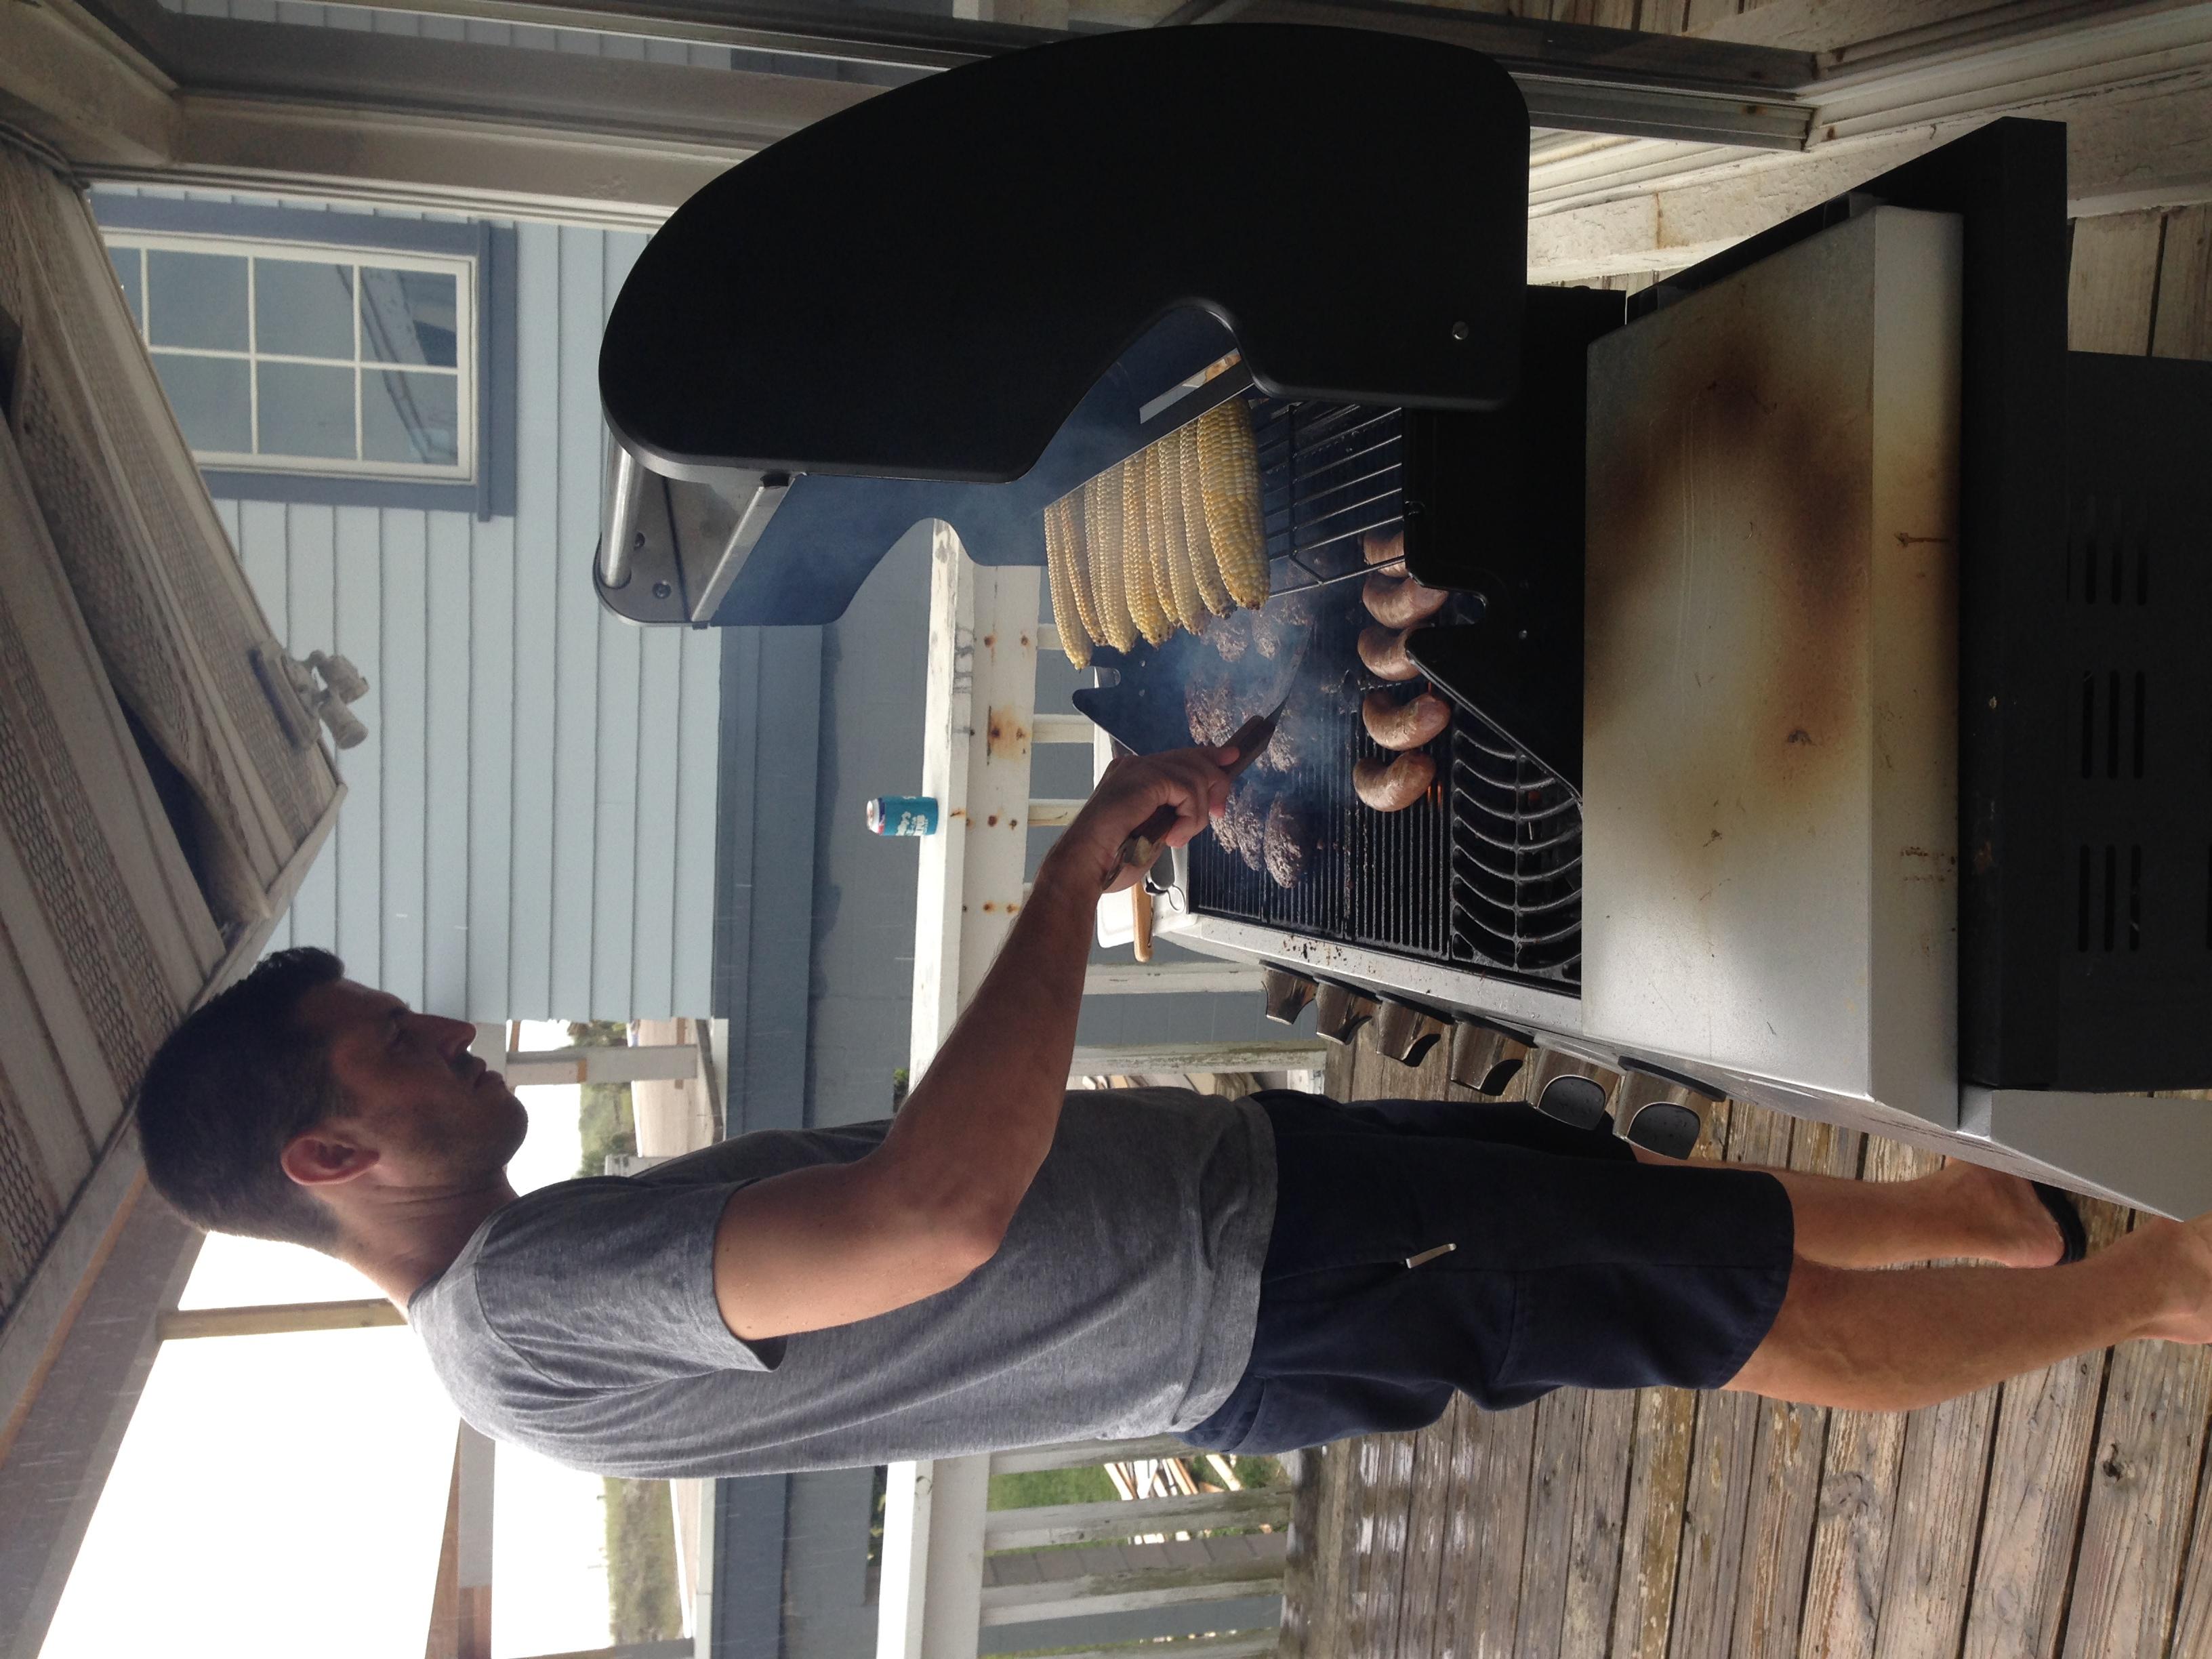 Jason at the grill.